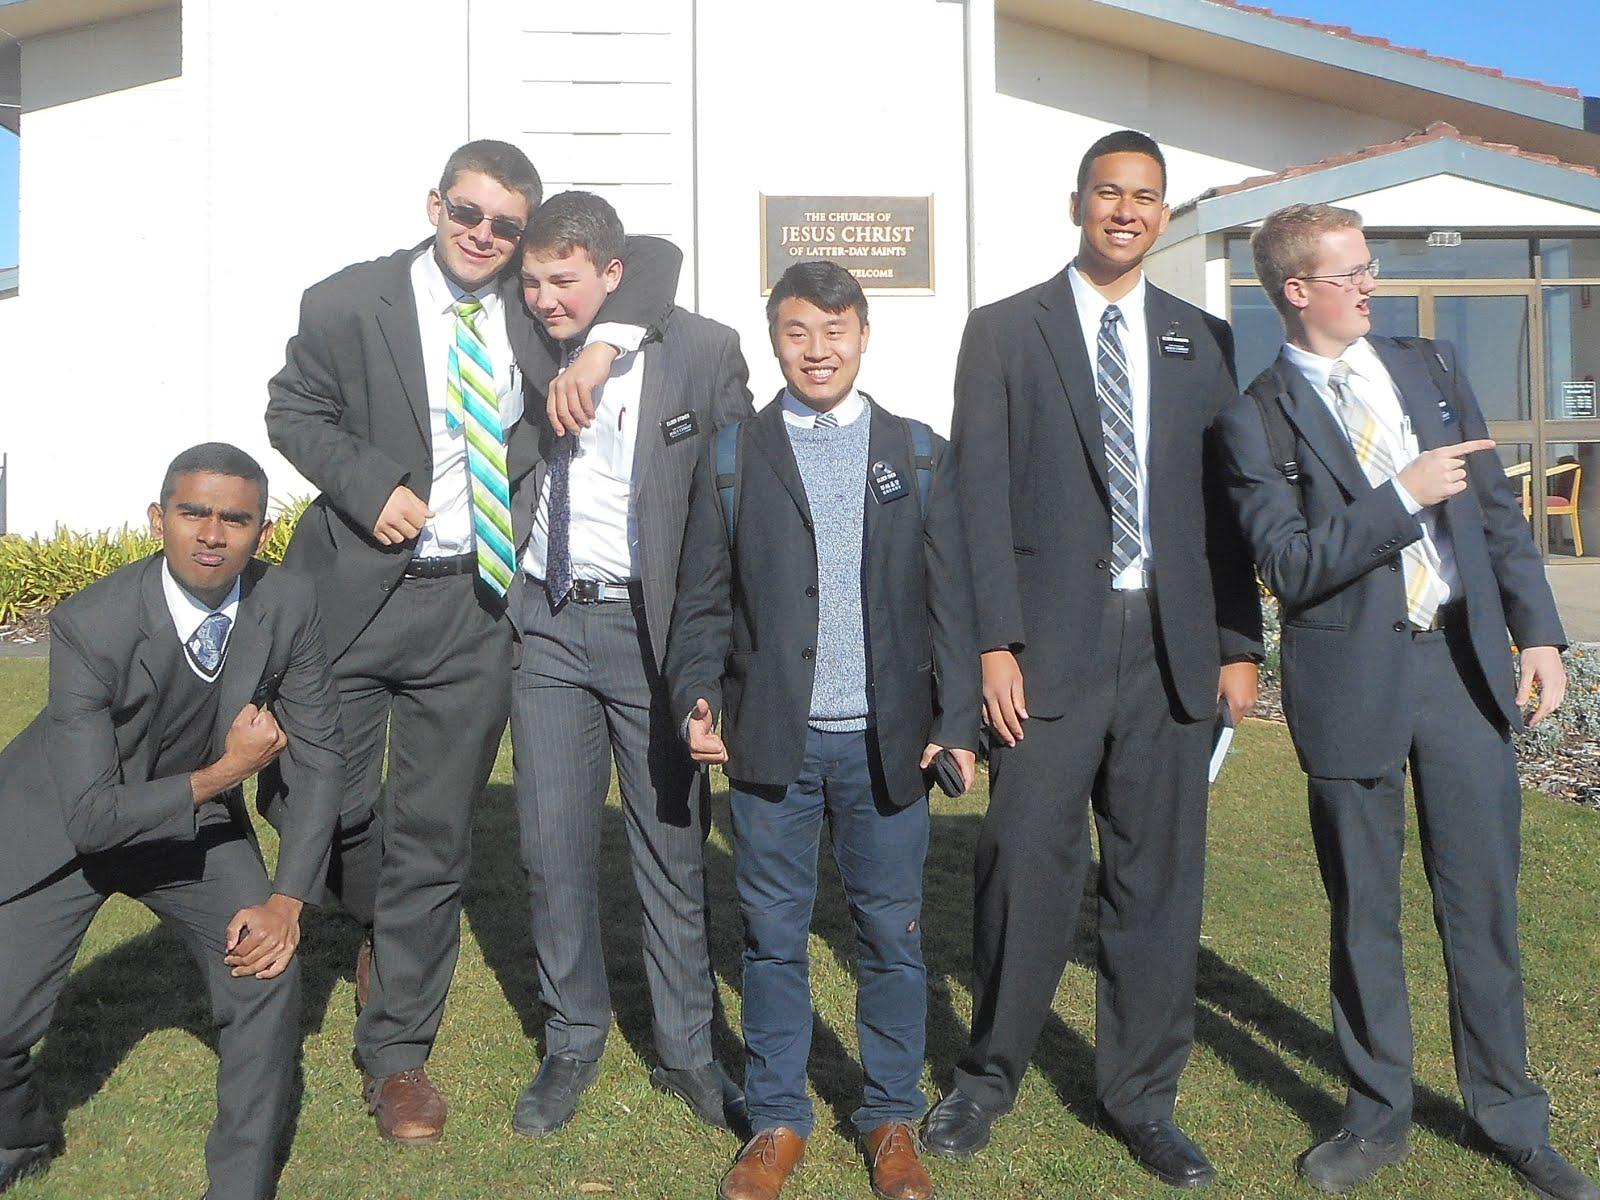 Launceston District Missionaries